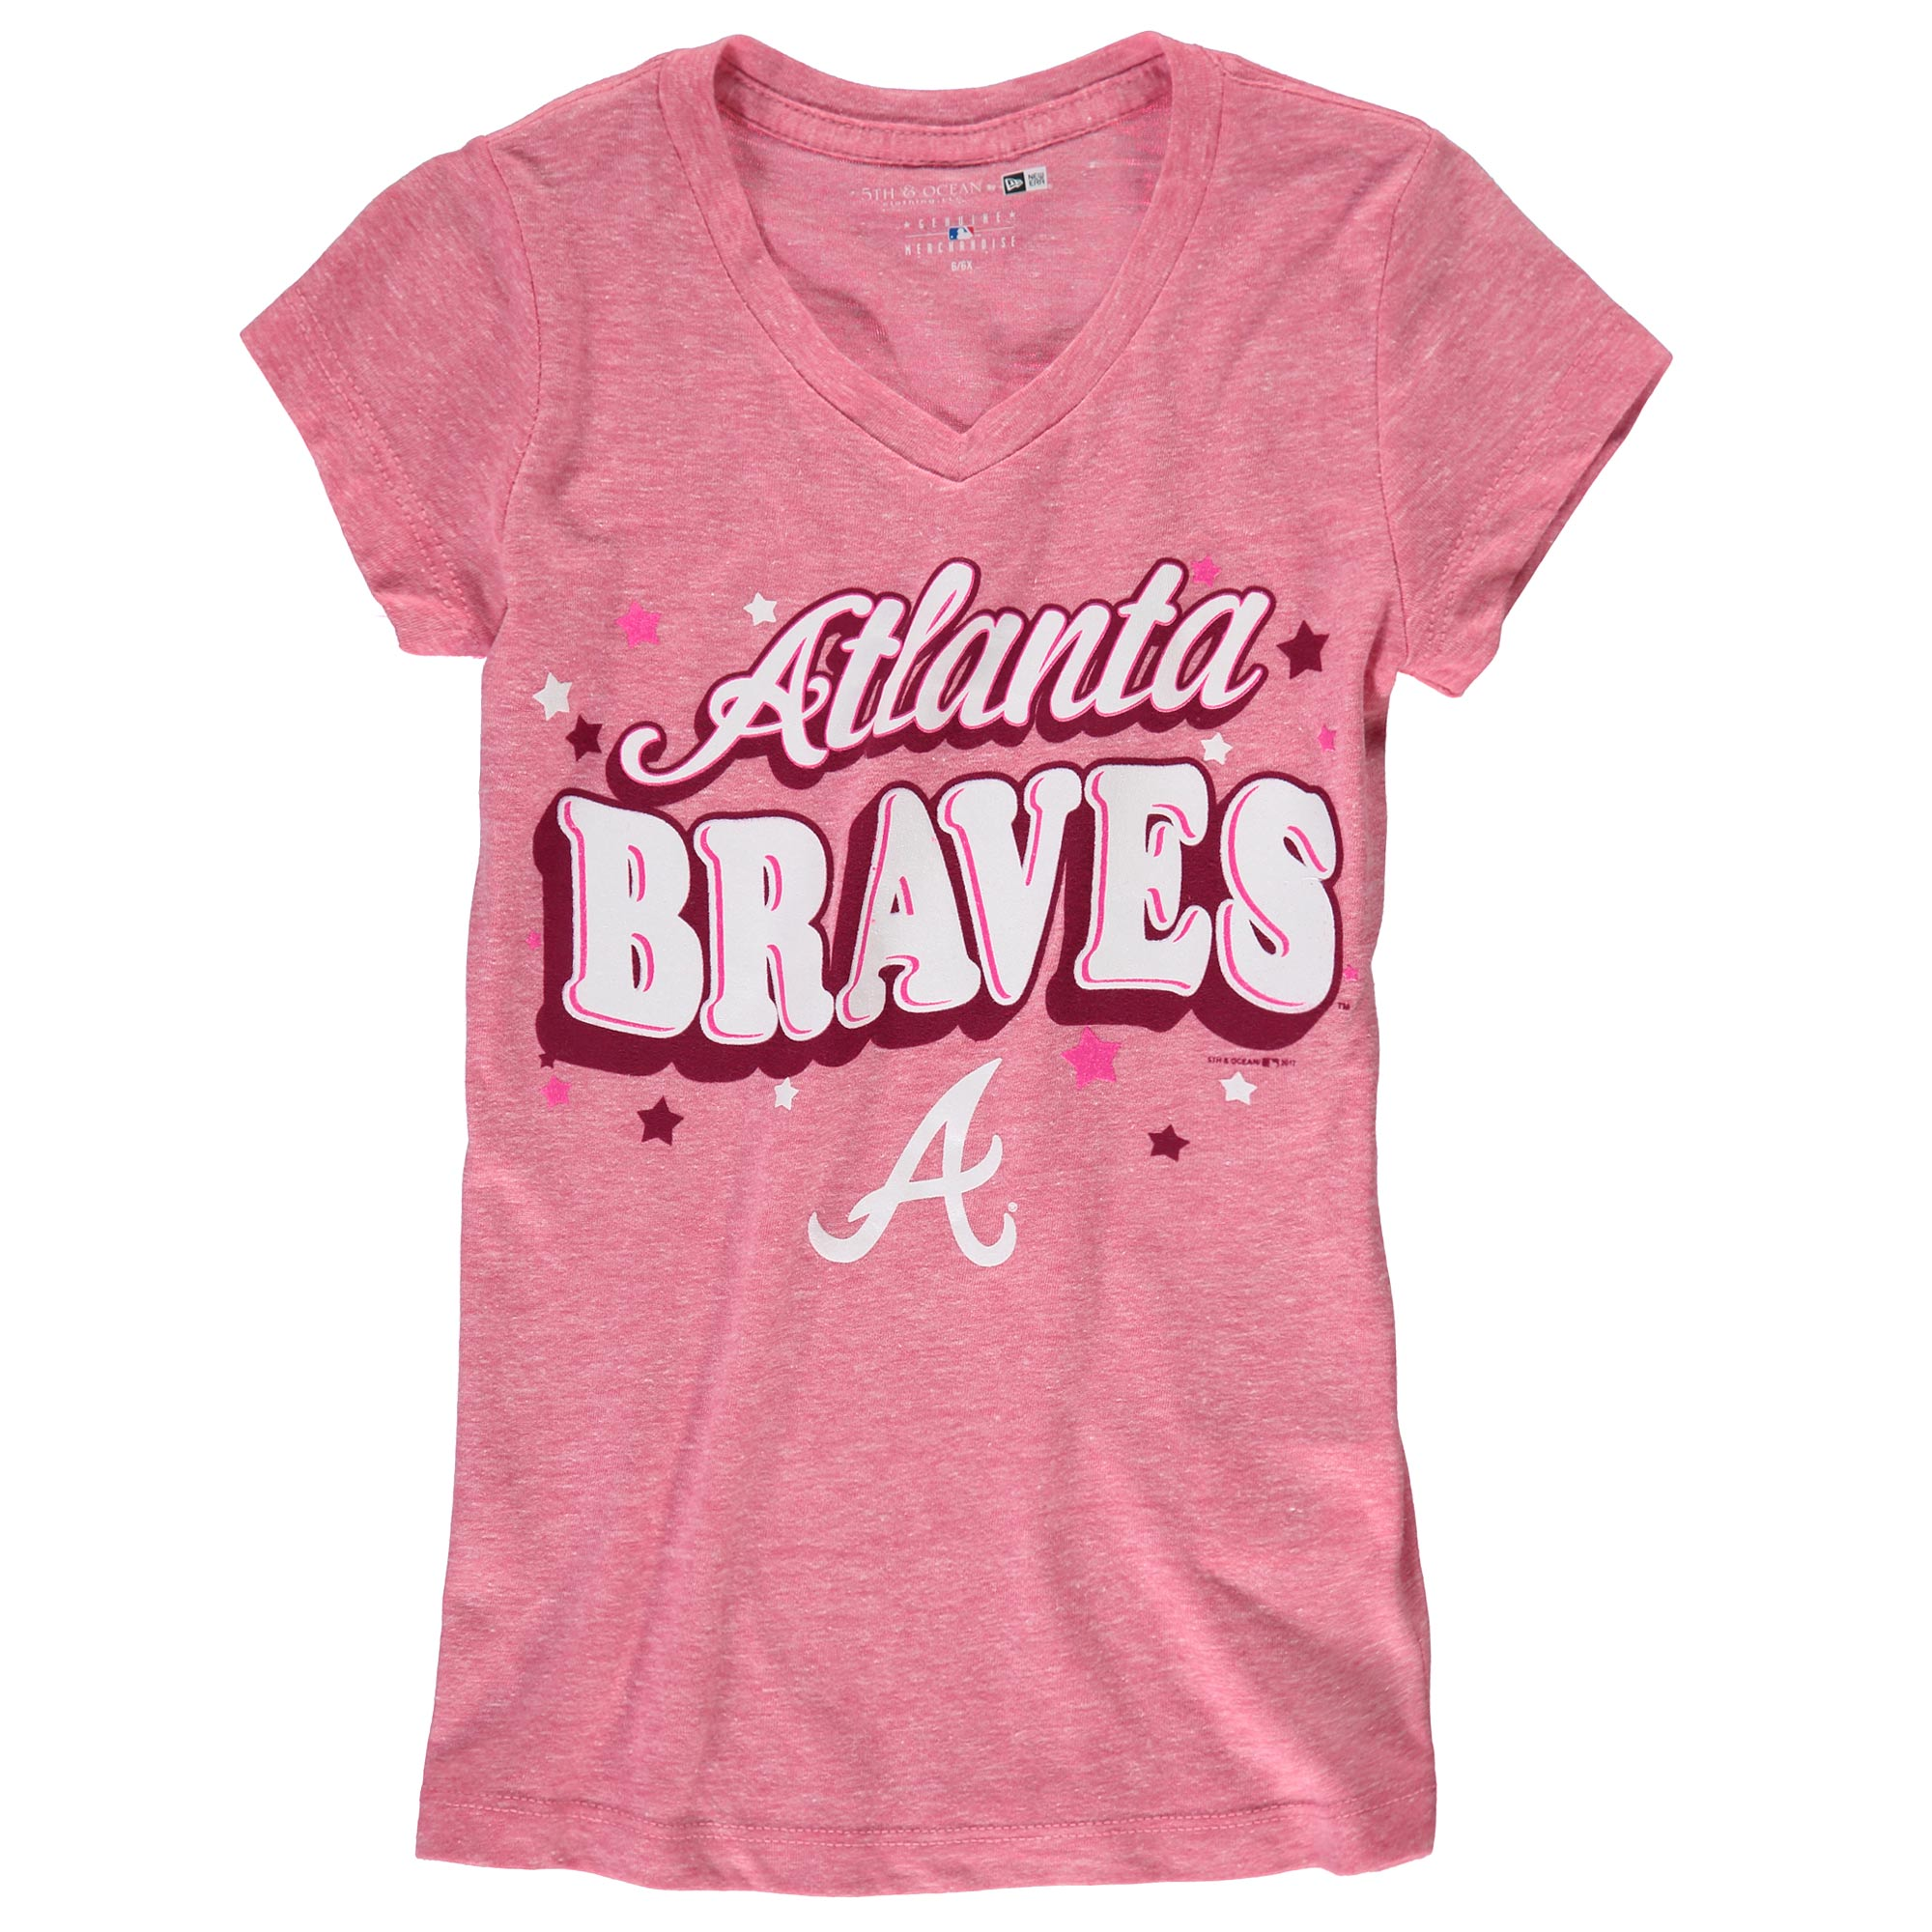 Atlanta Braves 5th & Ocean by New Era Girls Youth Stars Tri-Blend V-Neck T-Shirt - Pink